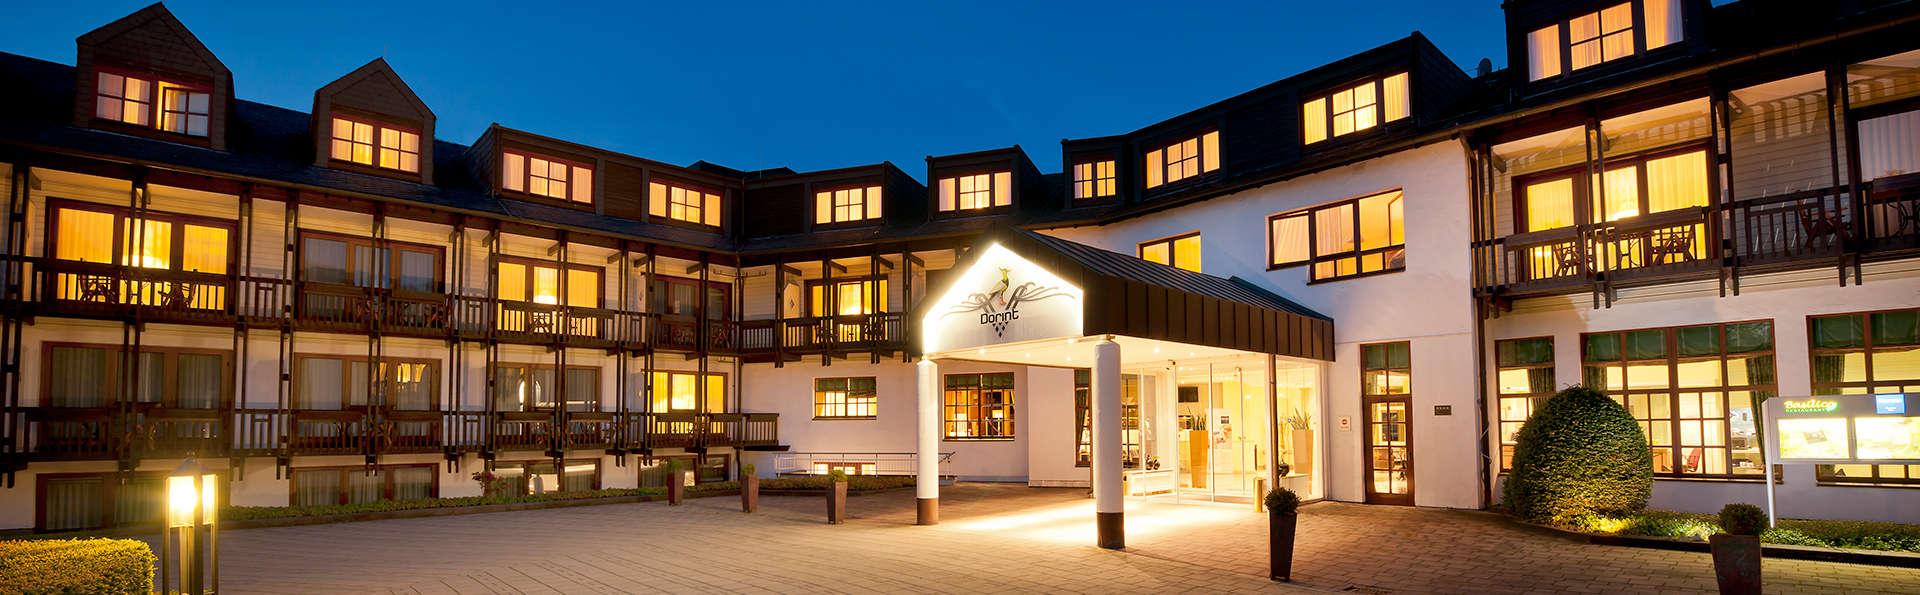 Dorint Hotel Venusberg Bonn - Edit_Front.jpg